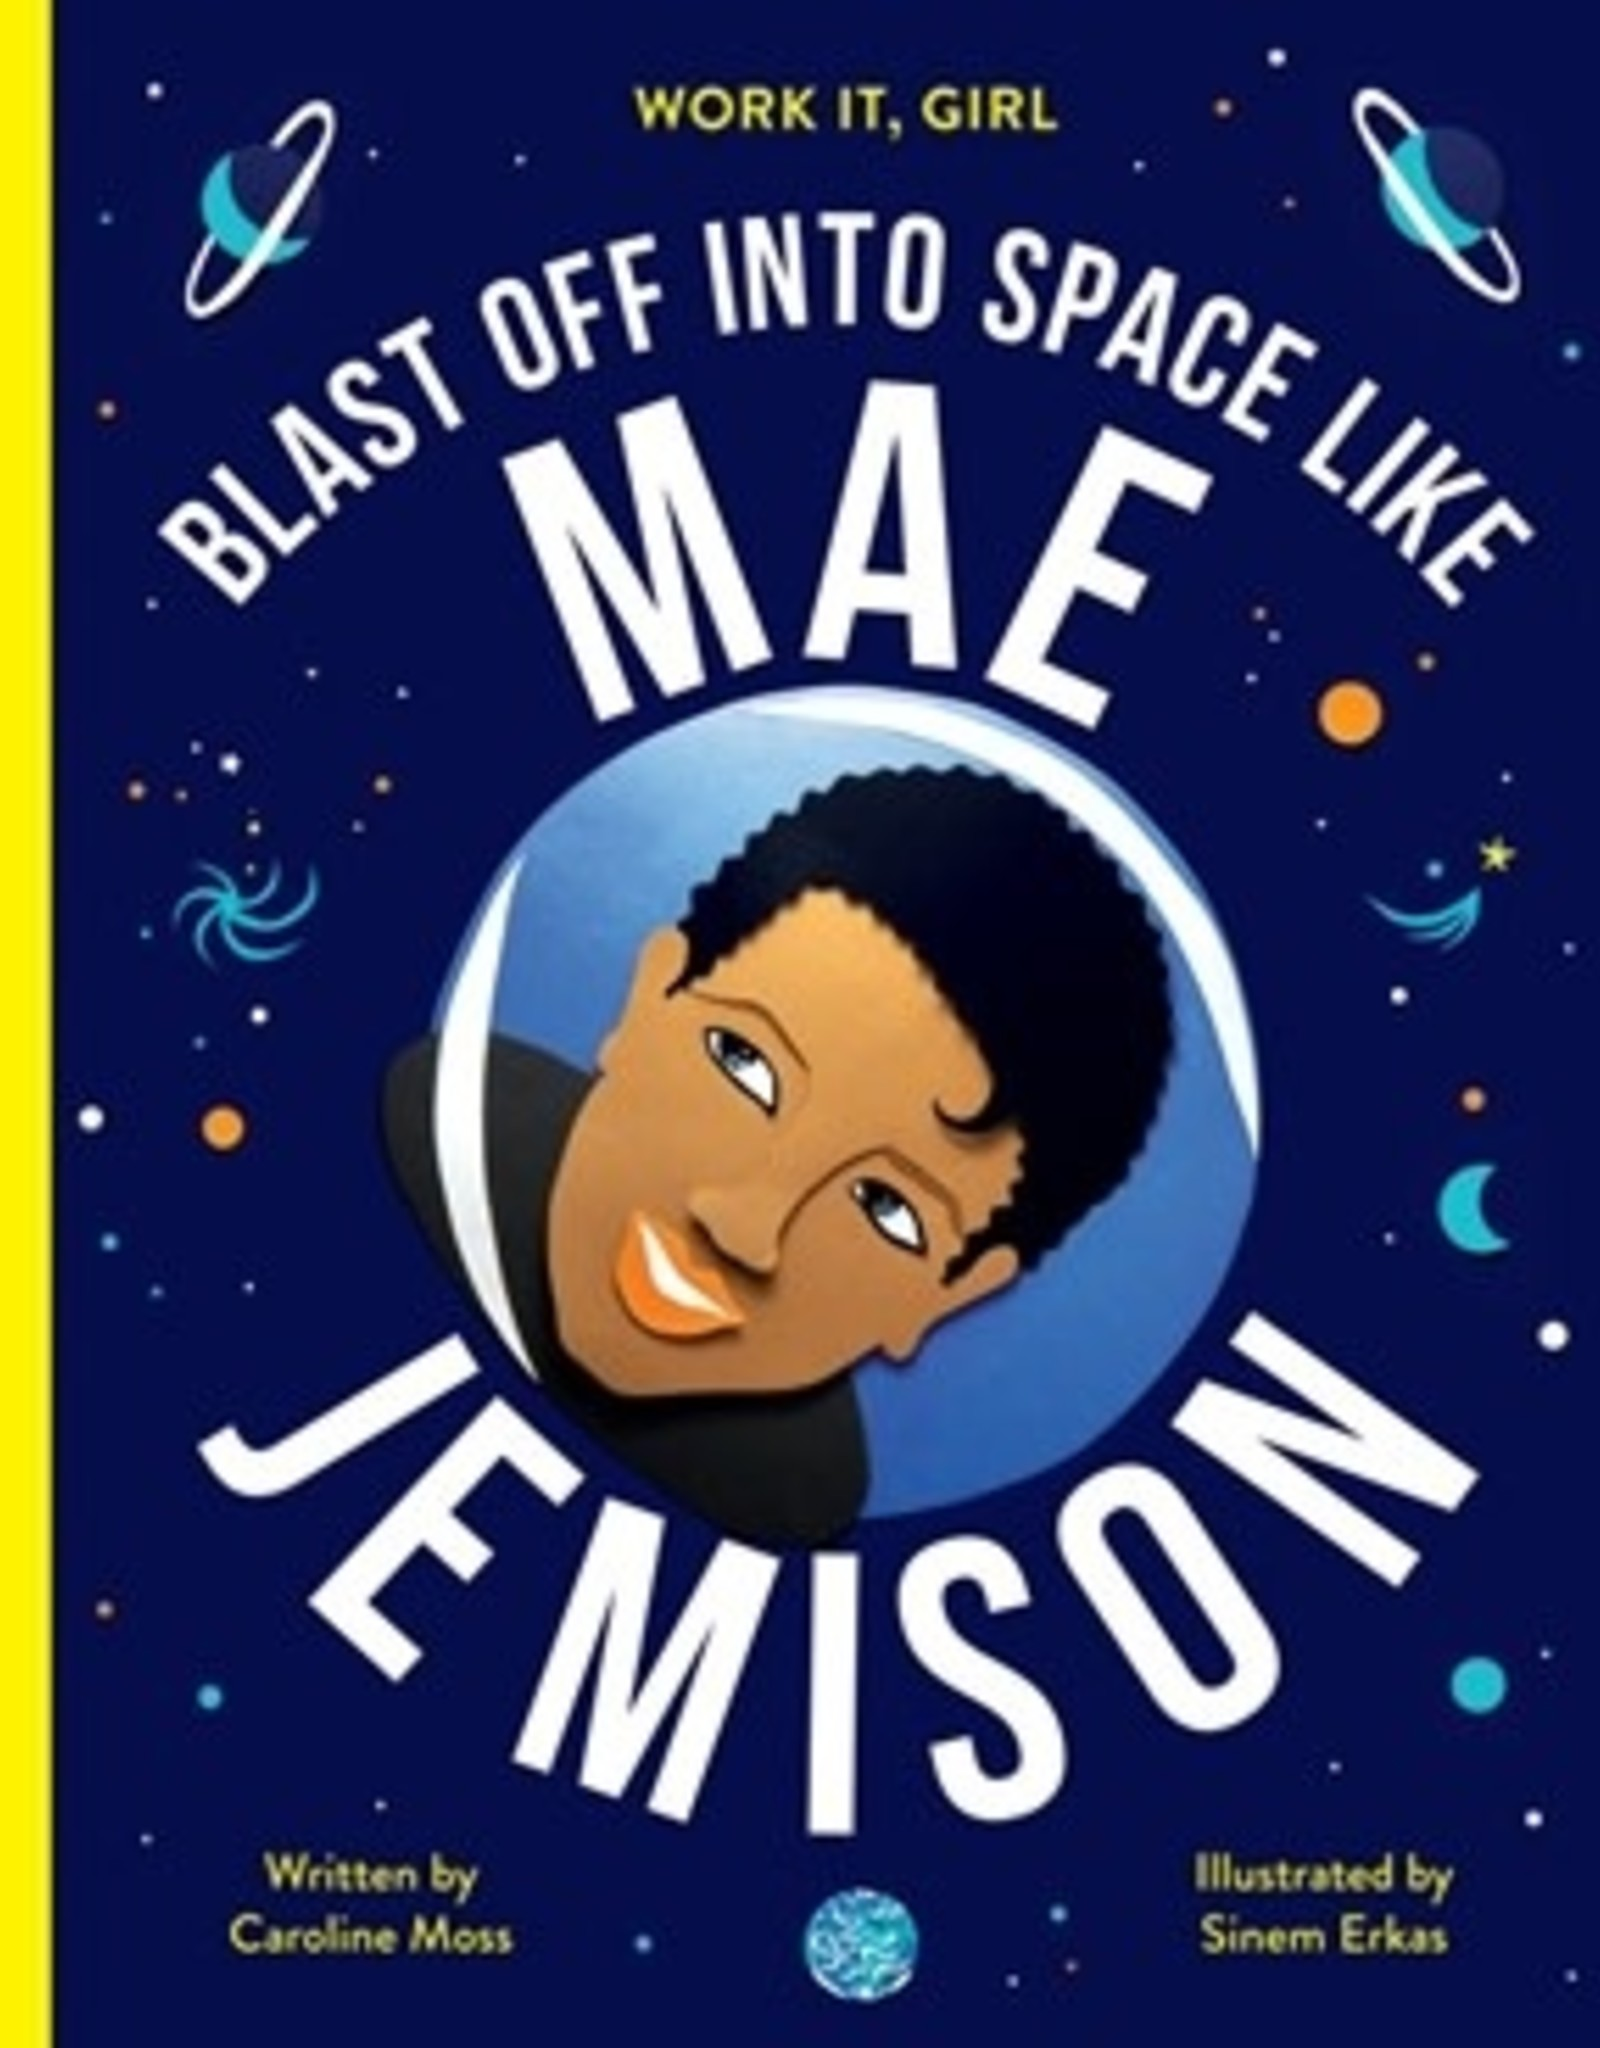 Work it Girl: Mae Jemison: Blast Off Into Space Like by Caroline Moss and  Sinem Erkas